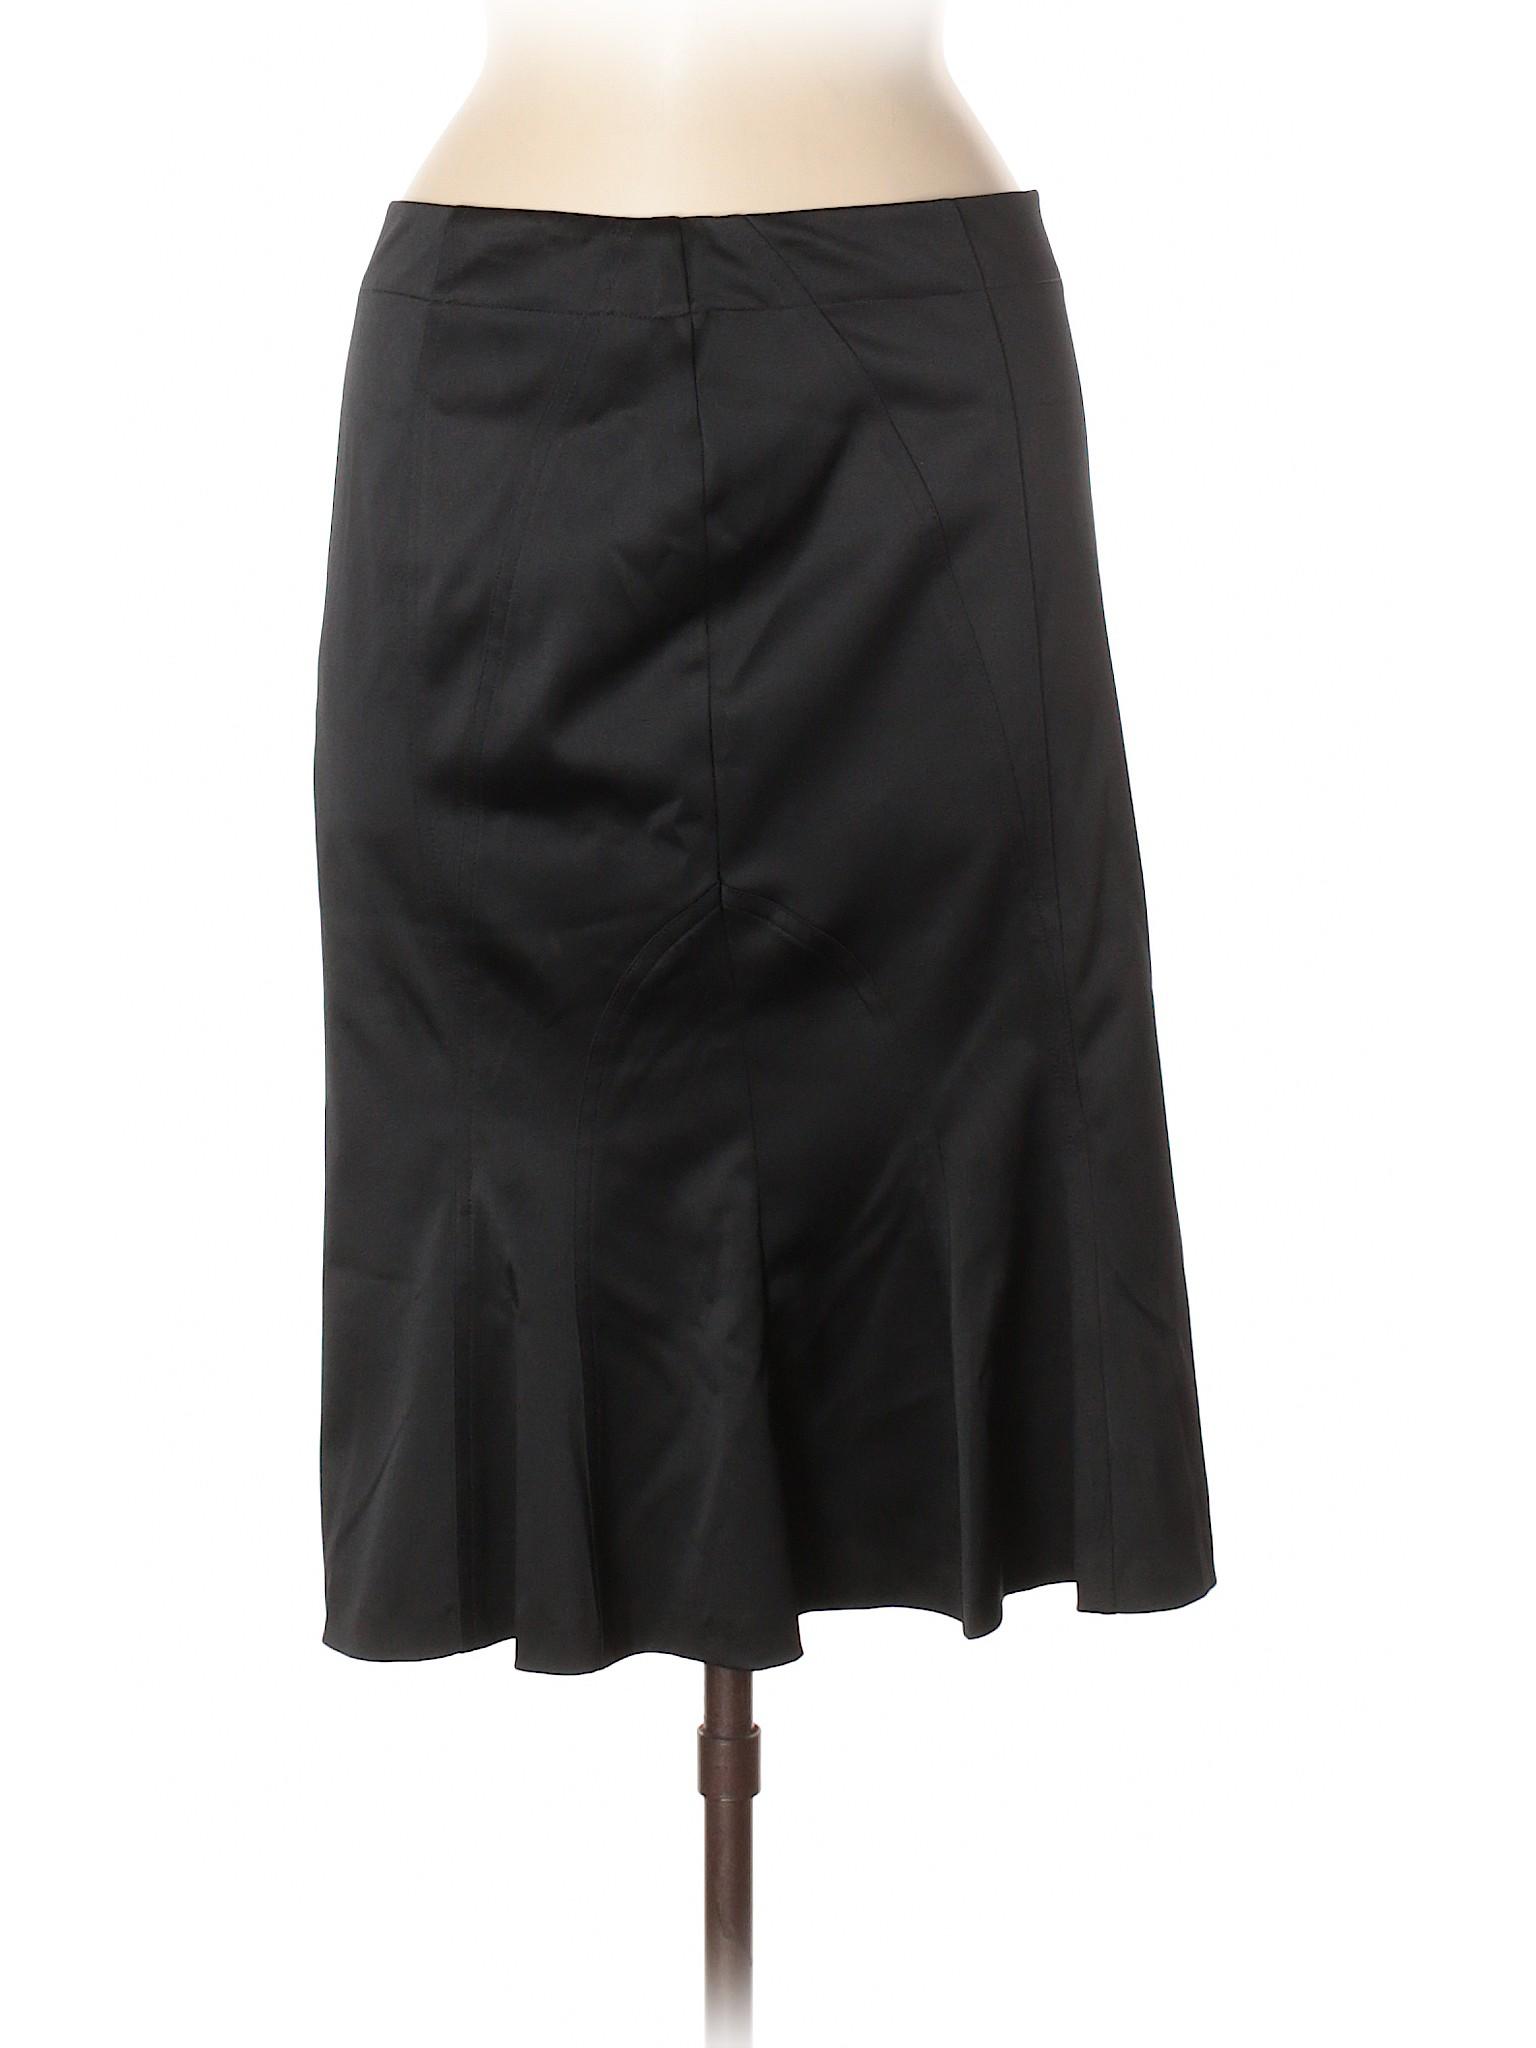 Casual Casual Boutique Skirt Boutique Boutique Casual Skirt Boutique Skirt Casual Ad8Raa4Tq